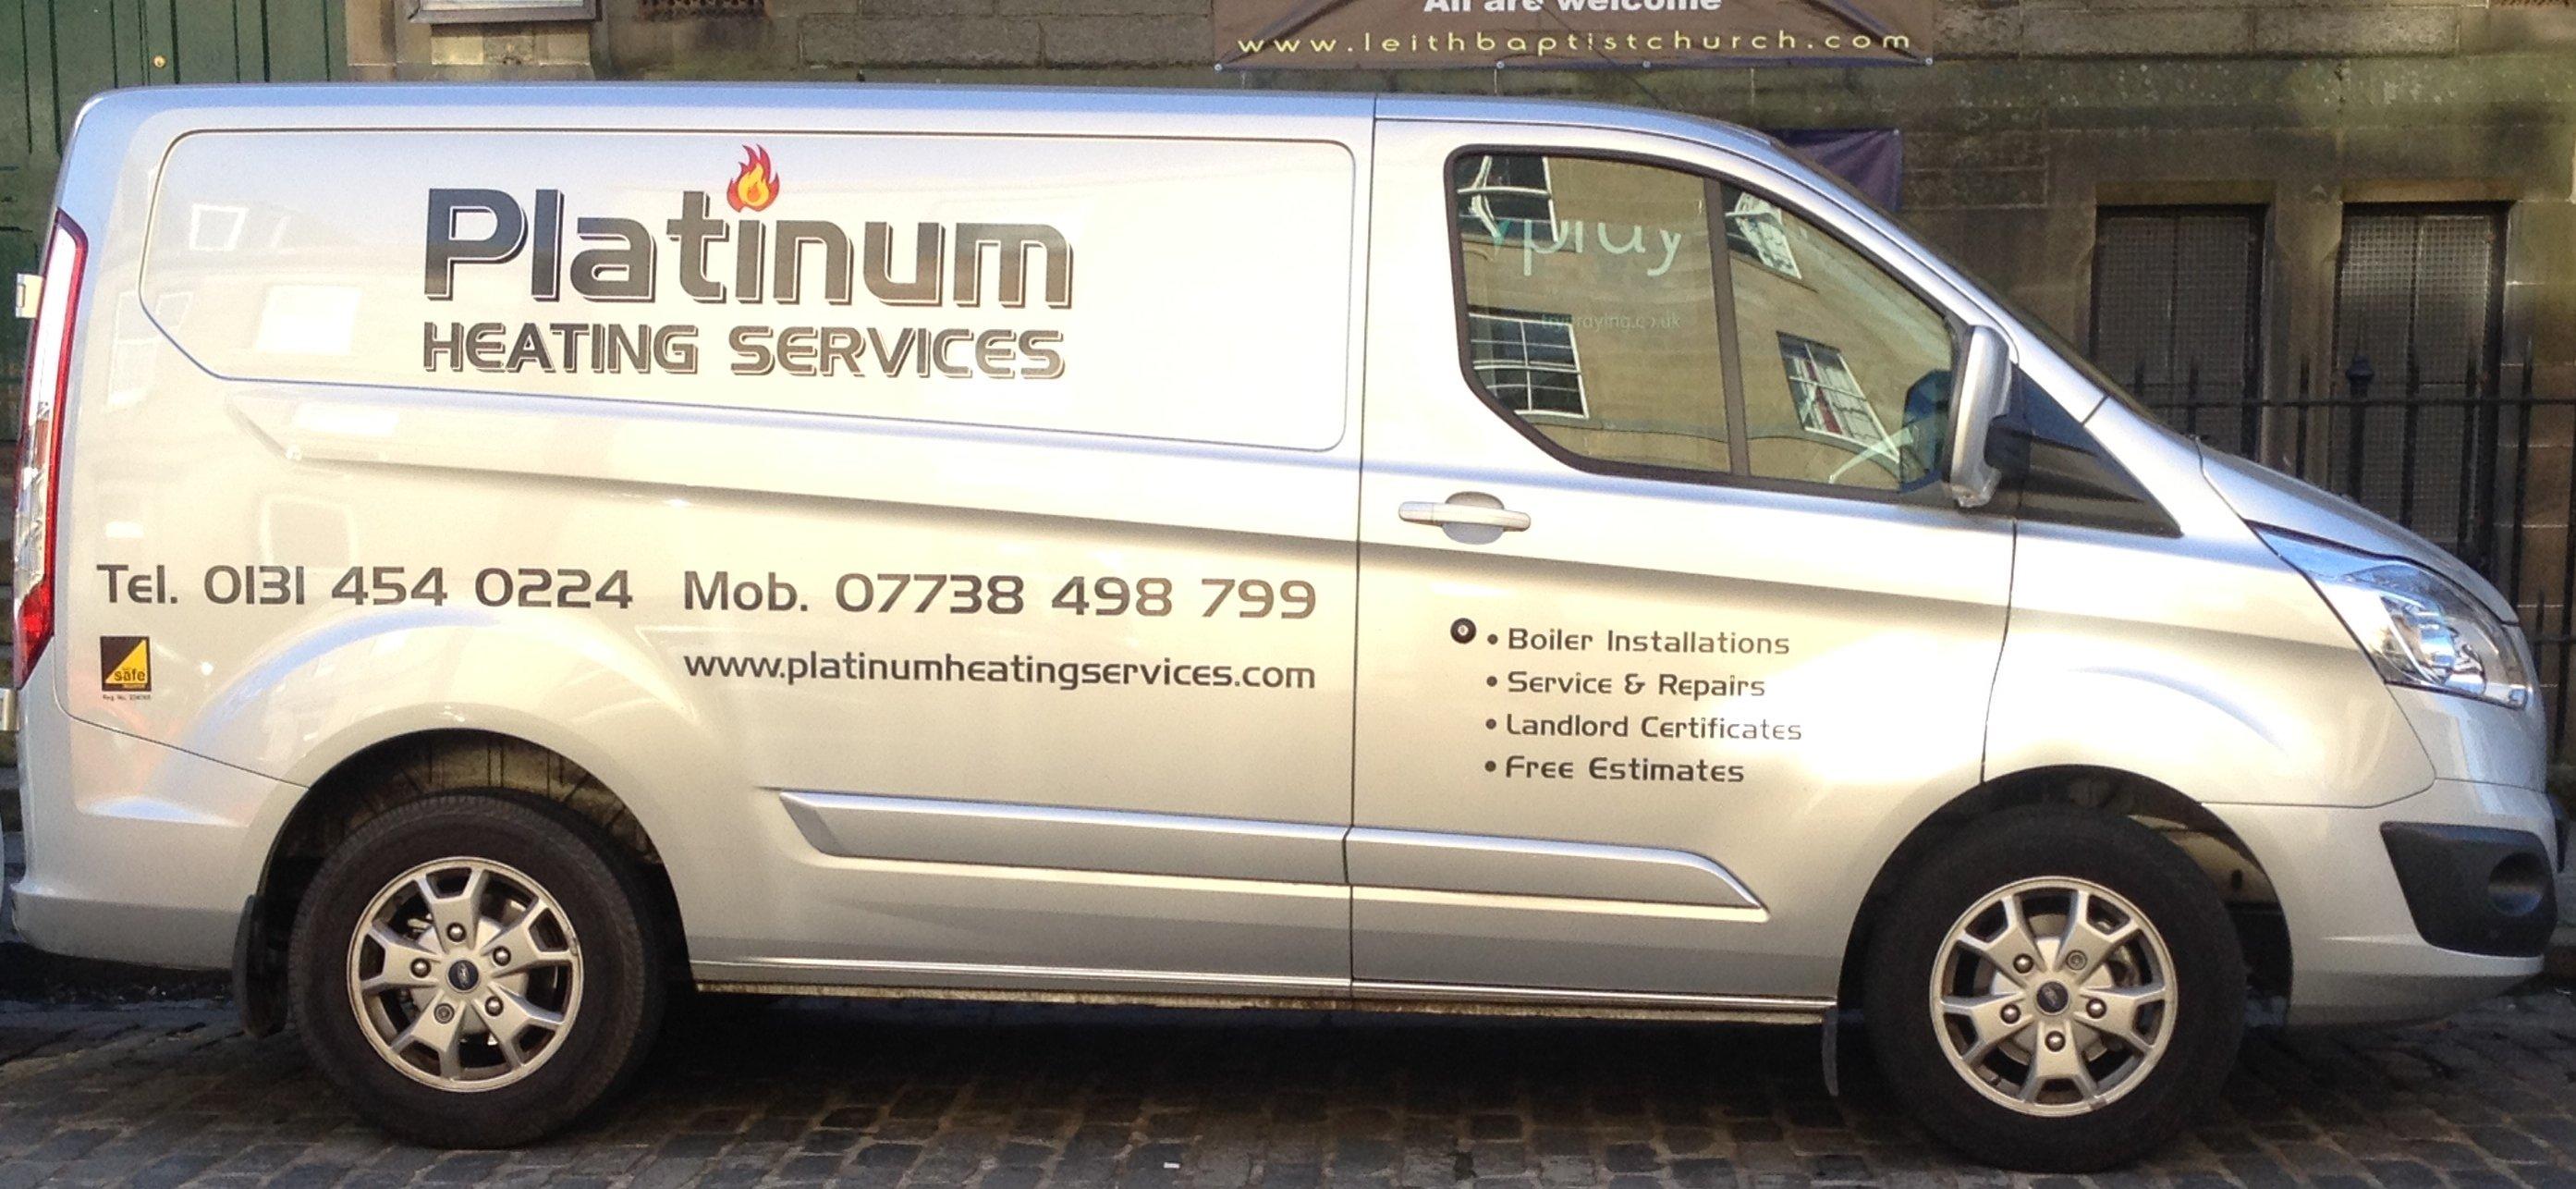 Platinum Heating Services company van